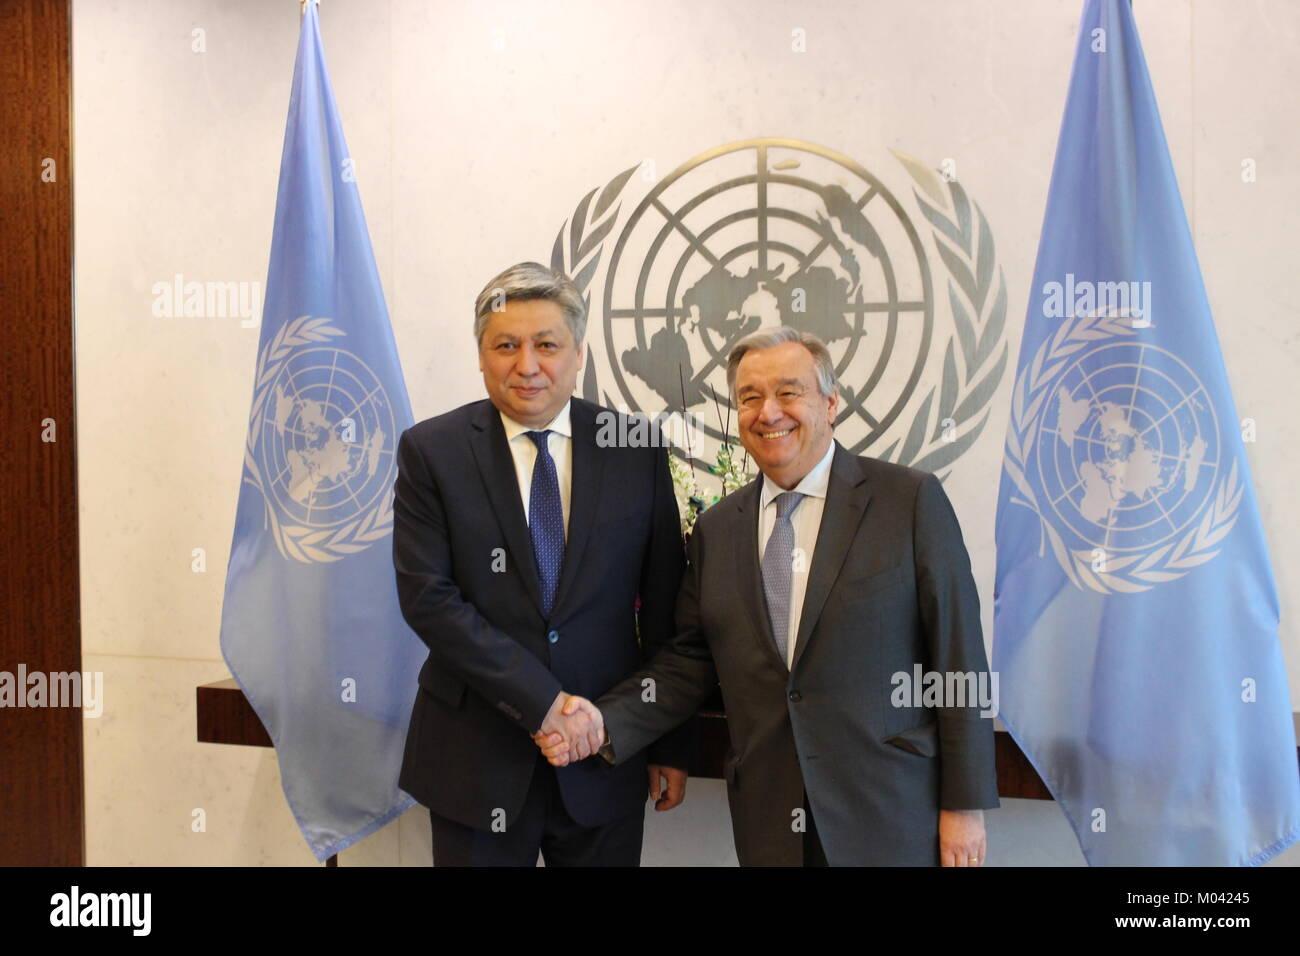 UN, New York, USA. 18th Jan, 2018. UN Sec-Gen Antonio Guterres met Kyrgyz Republic Foreign Minister Erlan Abdyldayev. Stock Photo